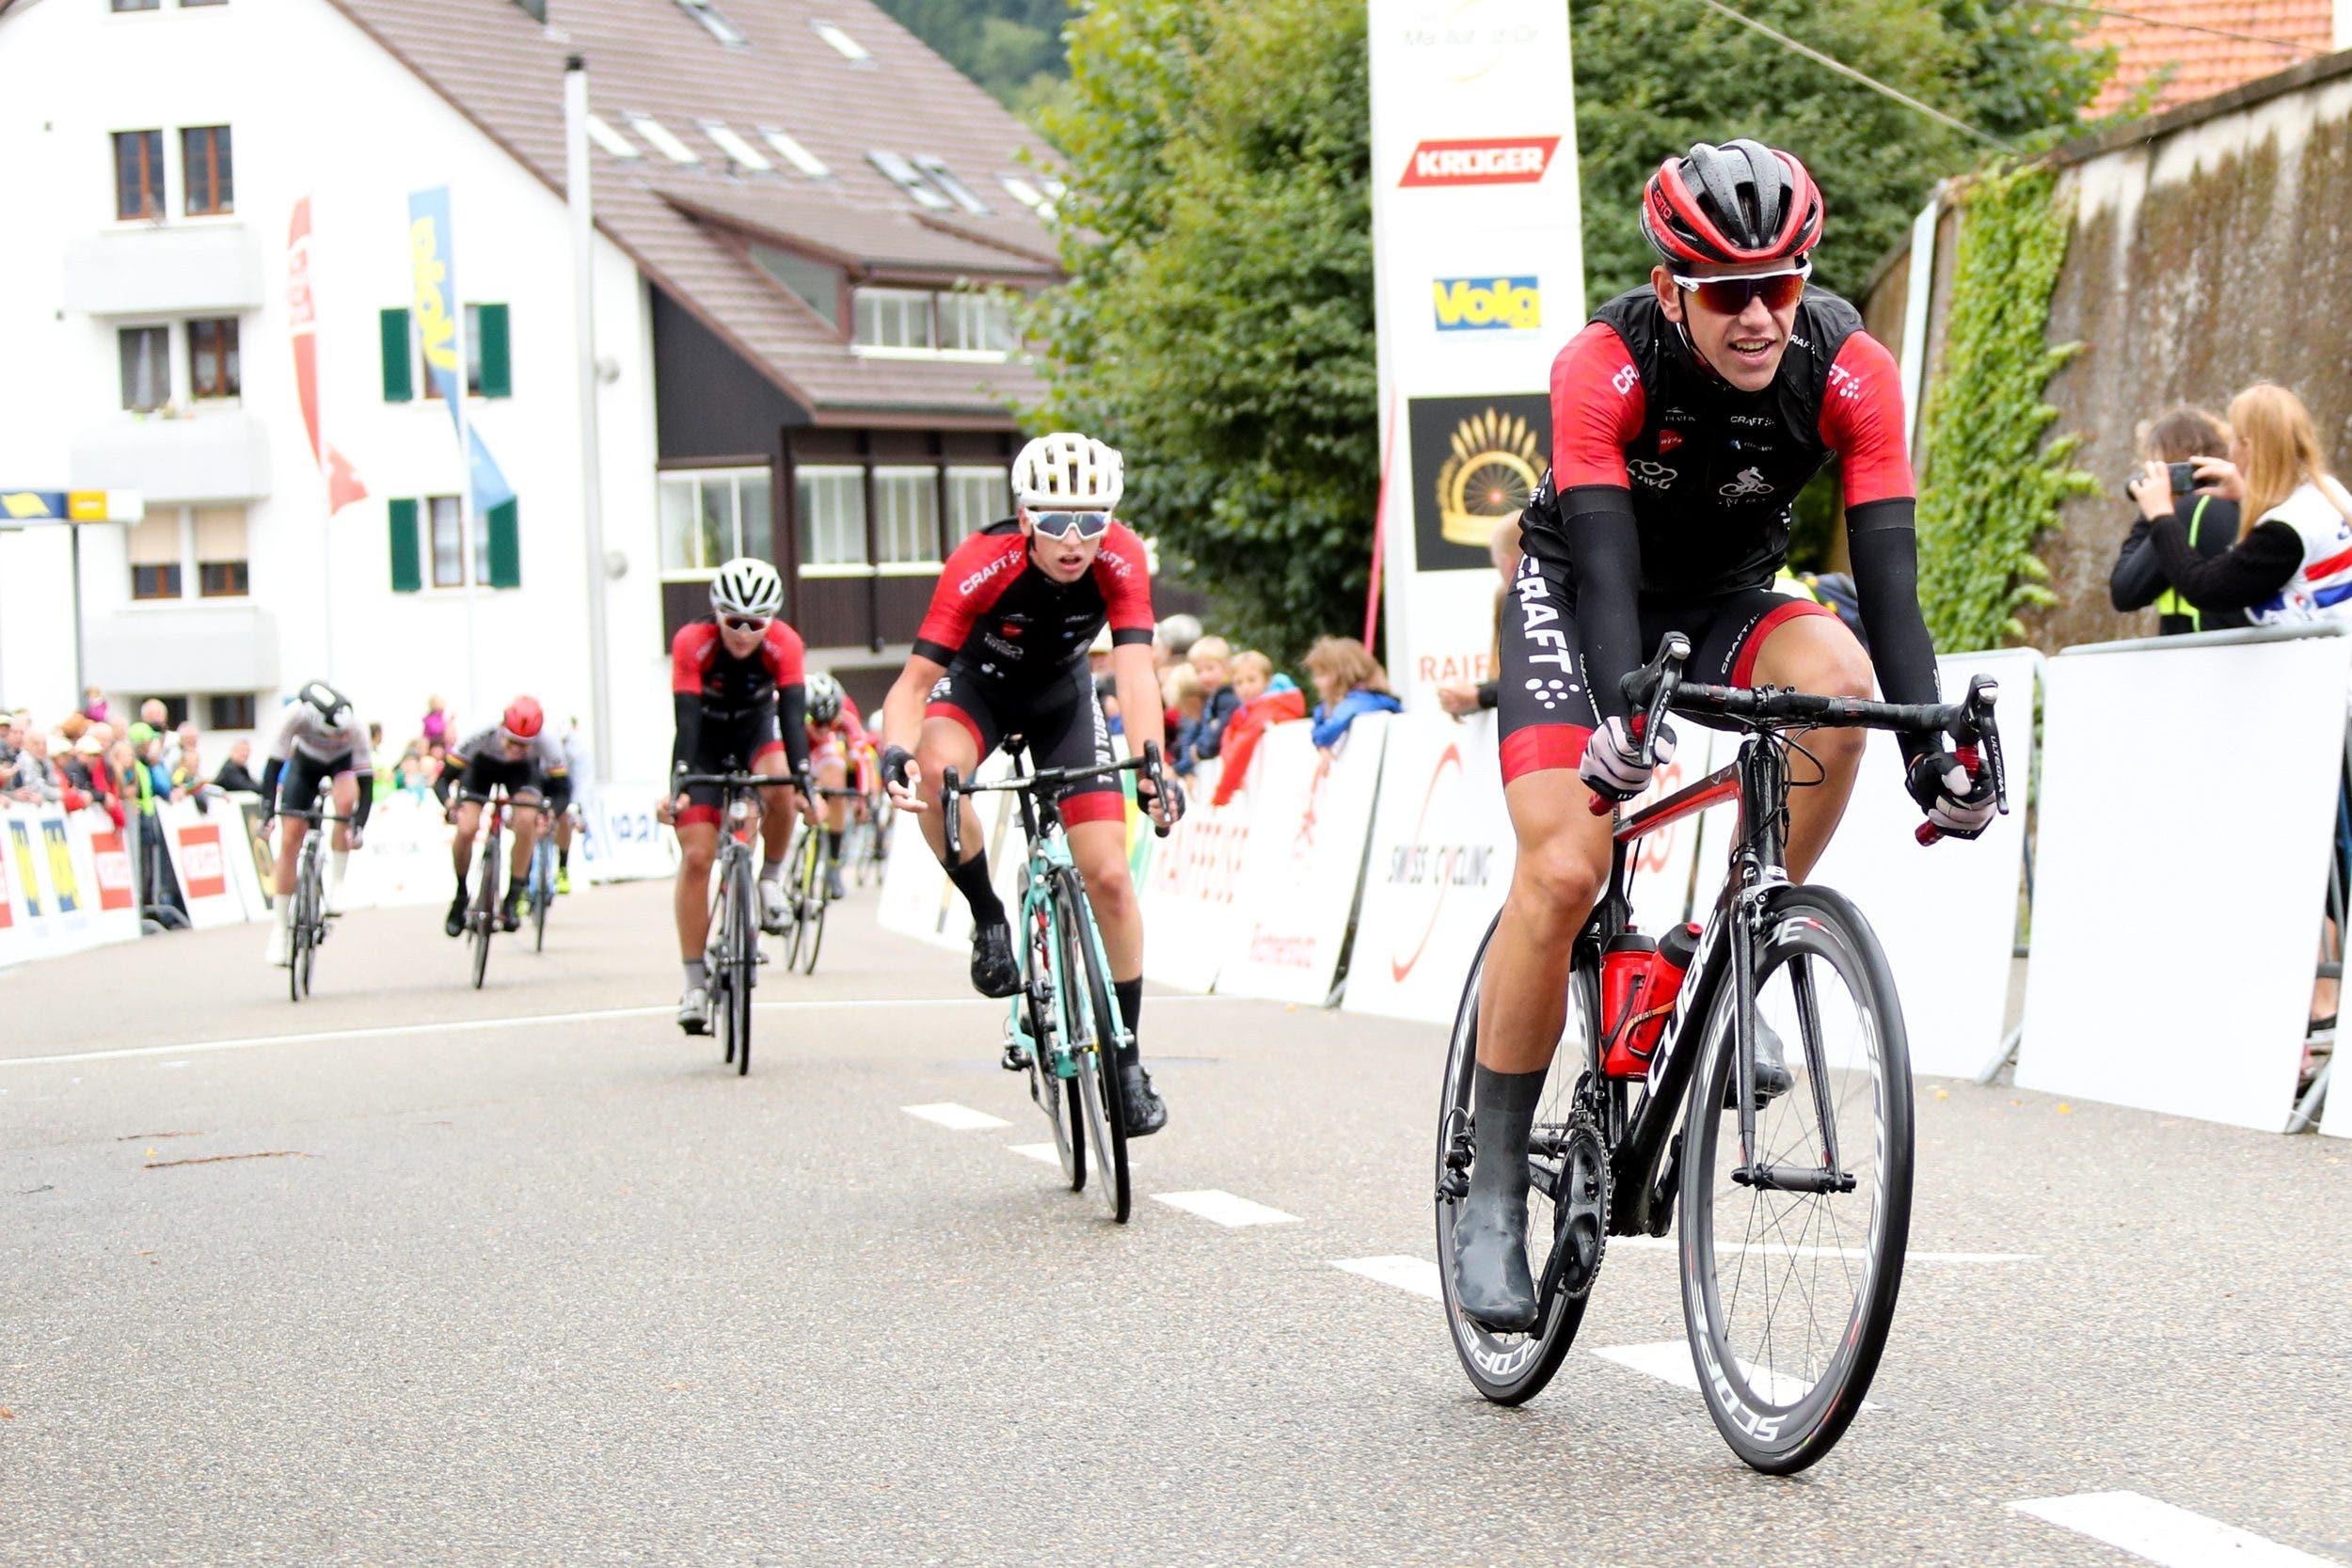 GP Rüebliland, Bericht 1. Etappe in Wittnau